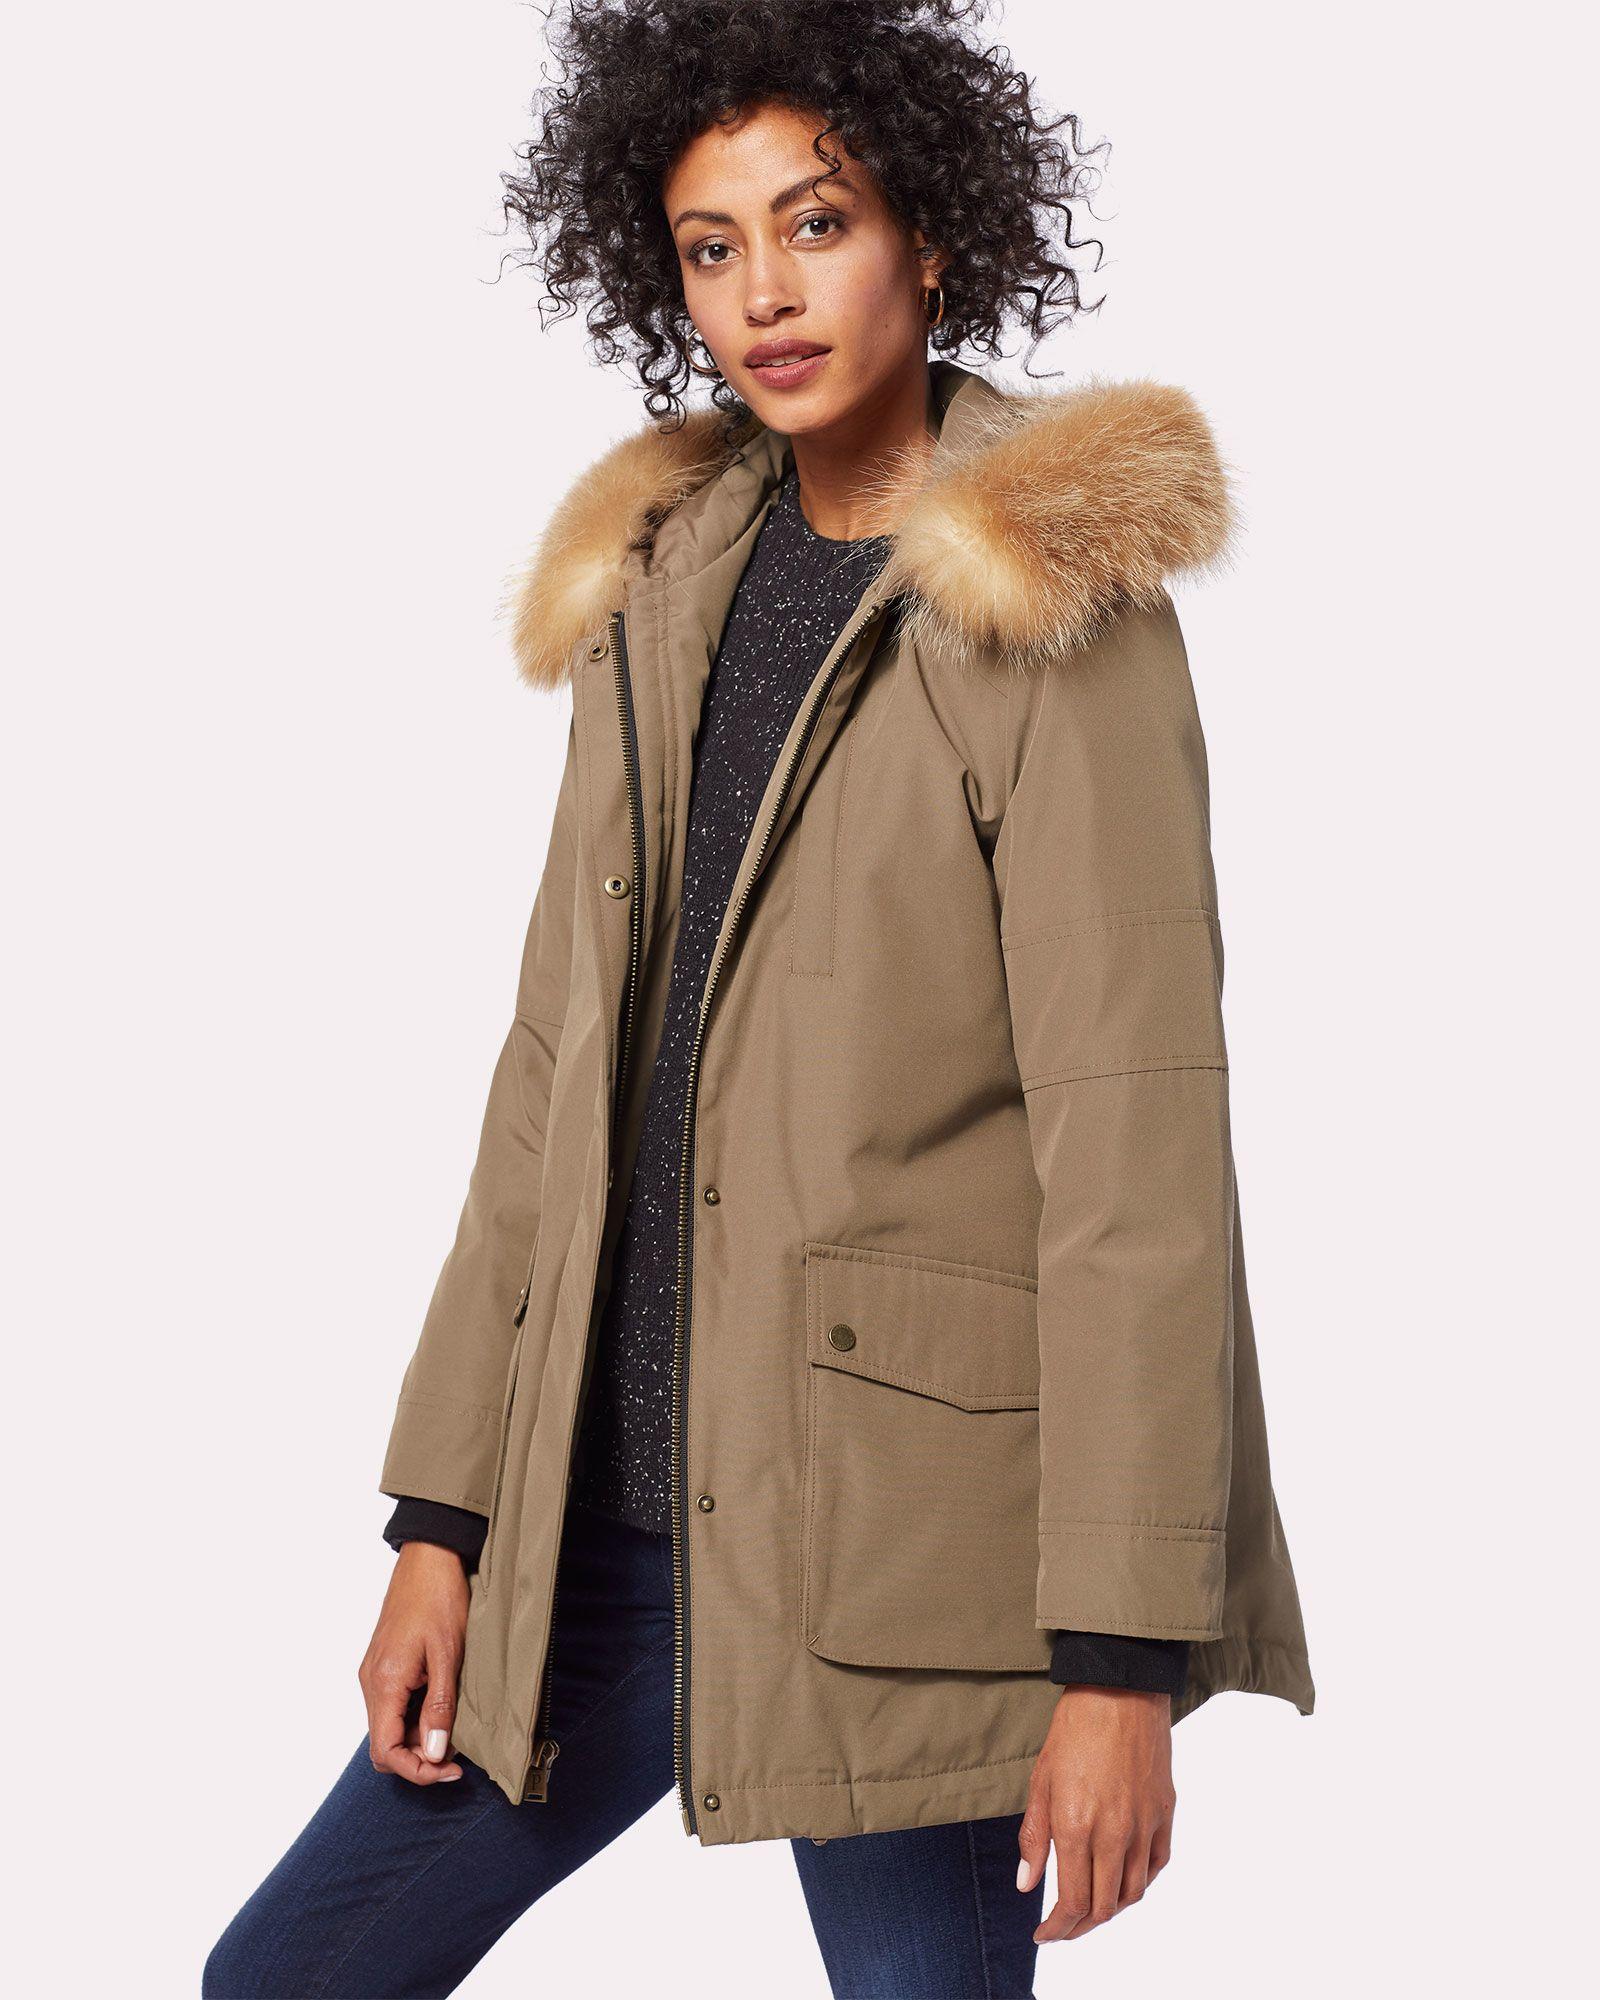 65c5b19de Pendleton signature dawson parka in 2019   Clothes to the Max and ...